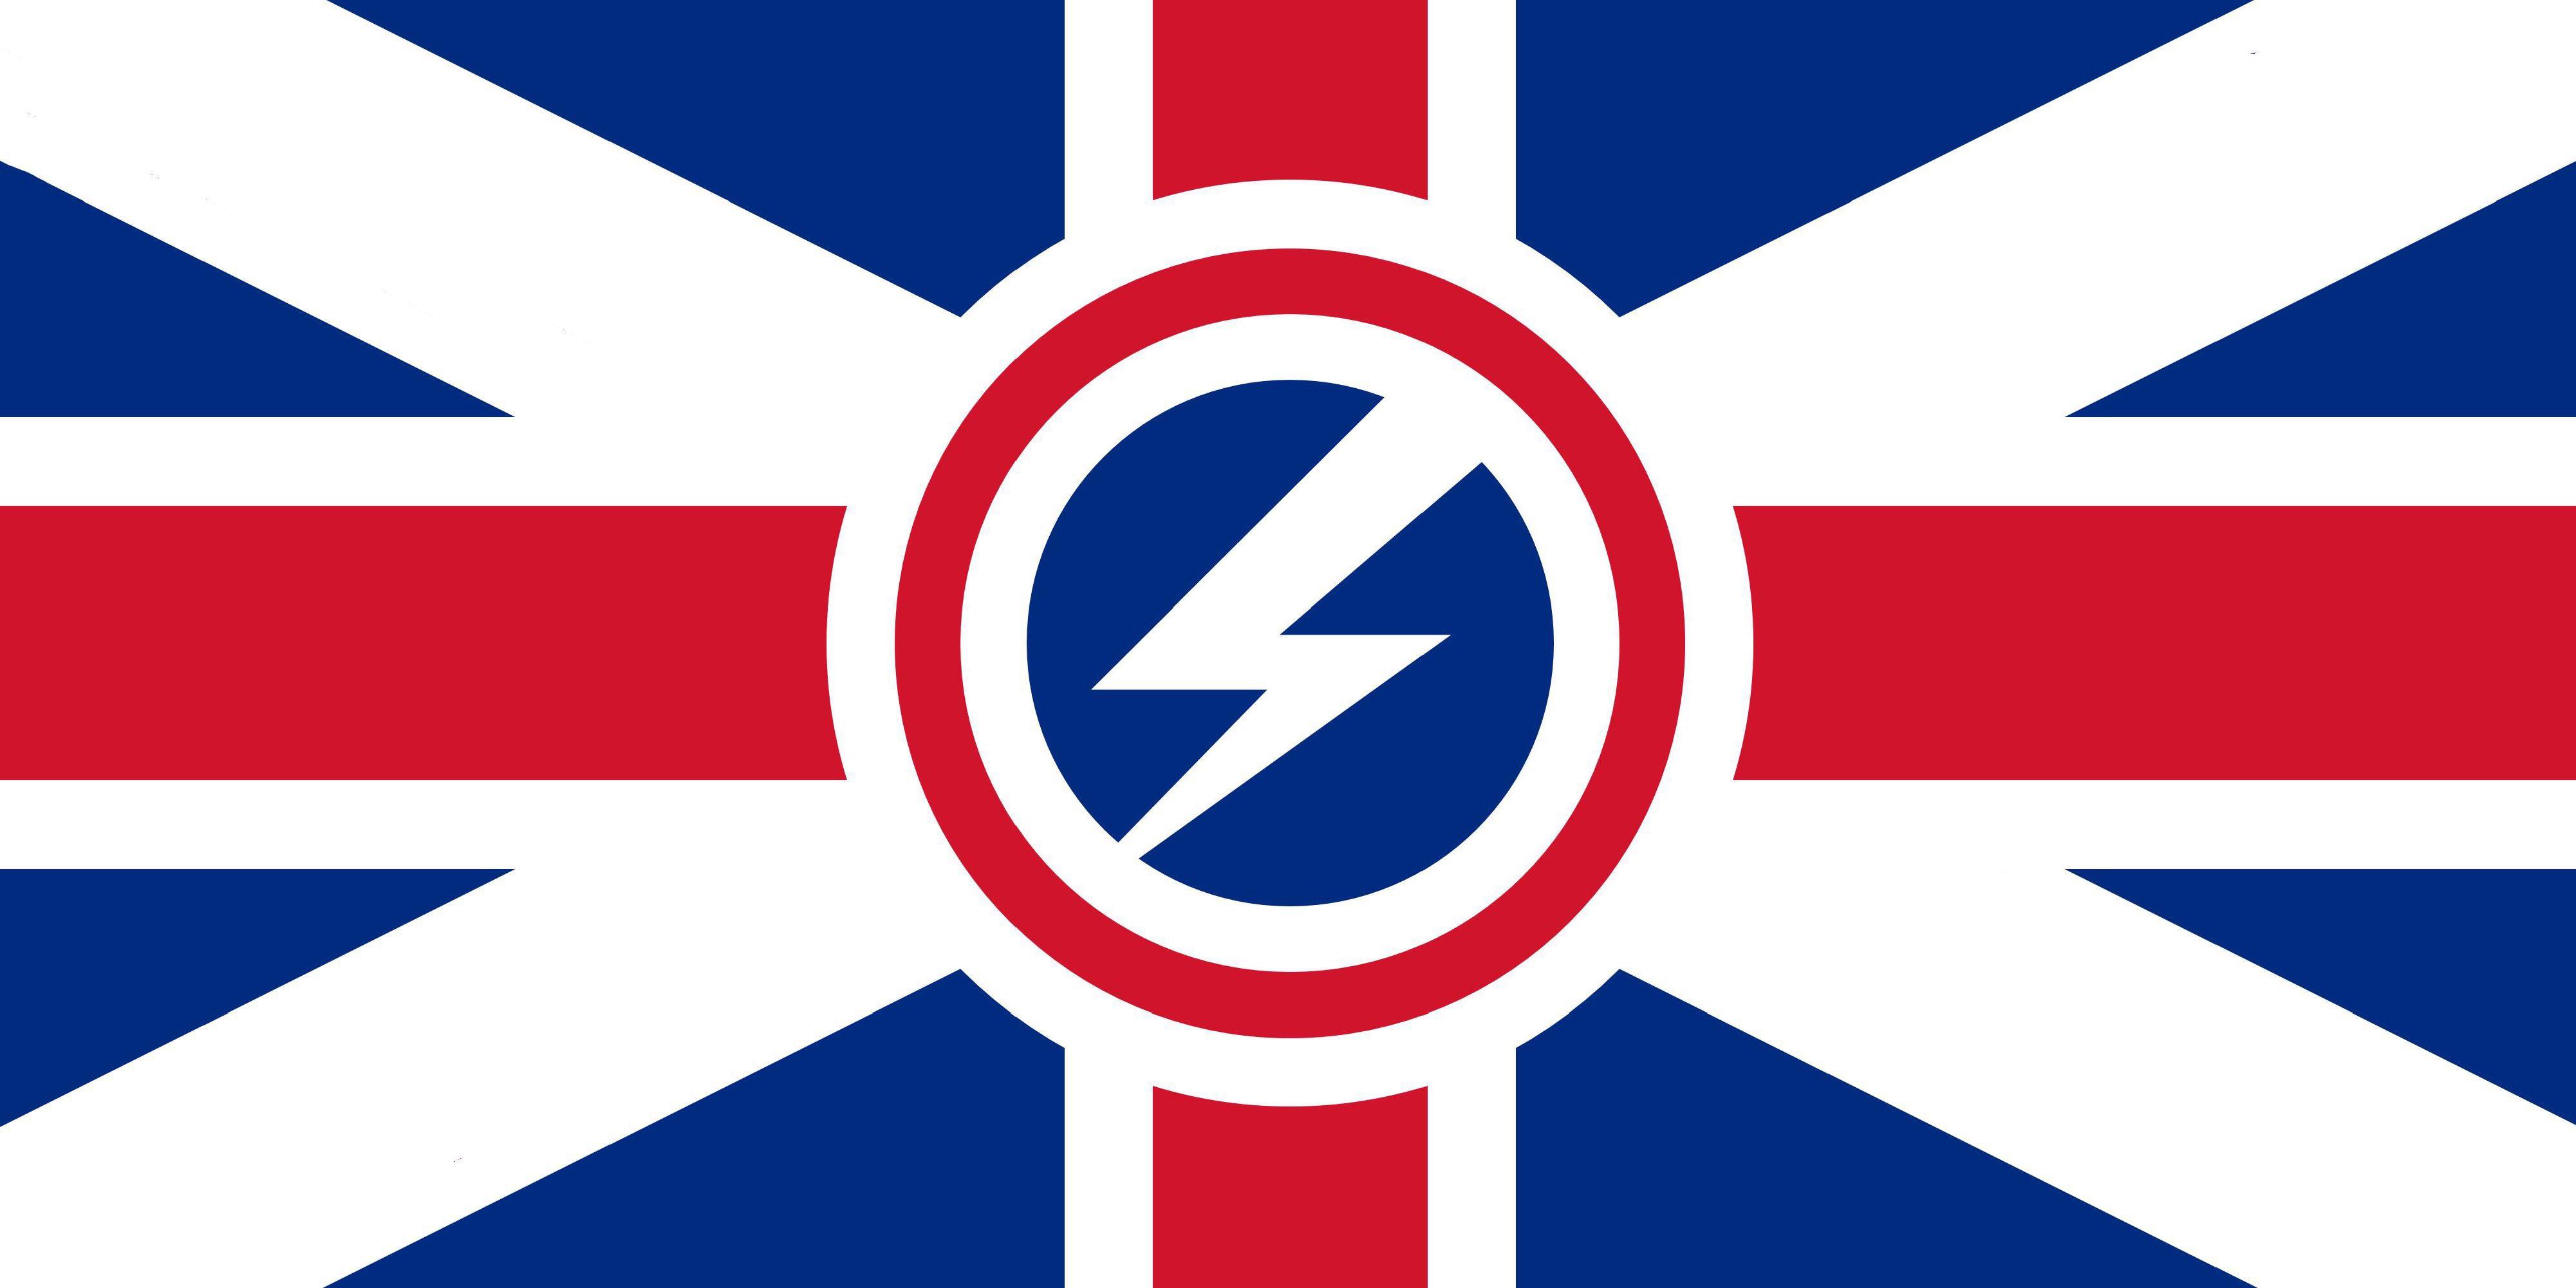 British Union (Agadir War)